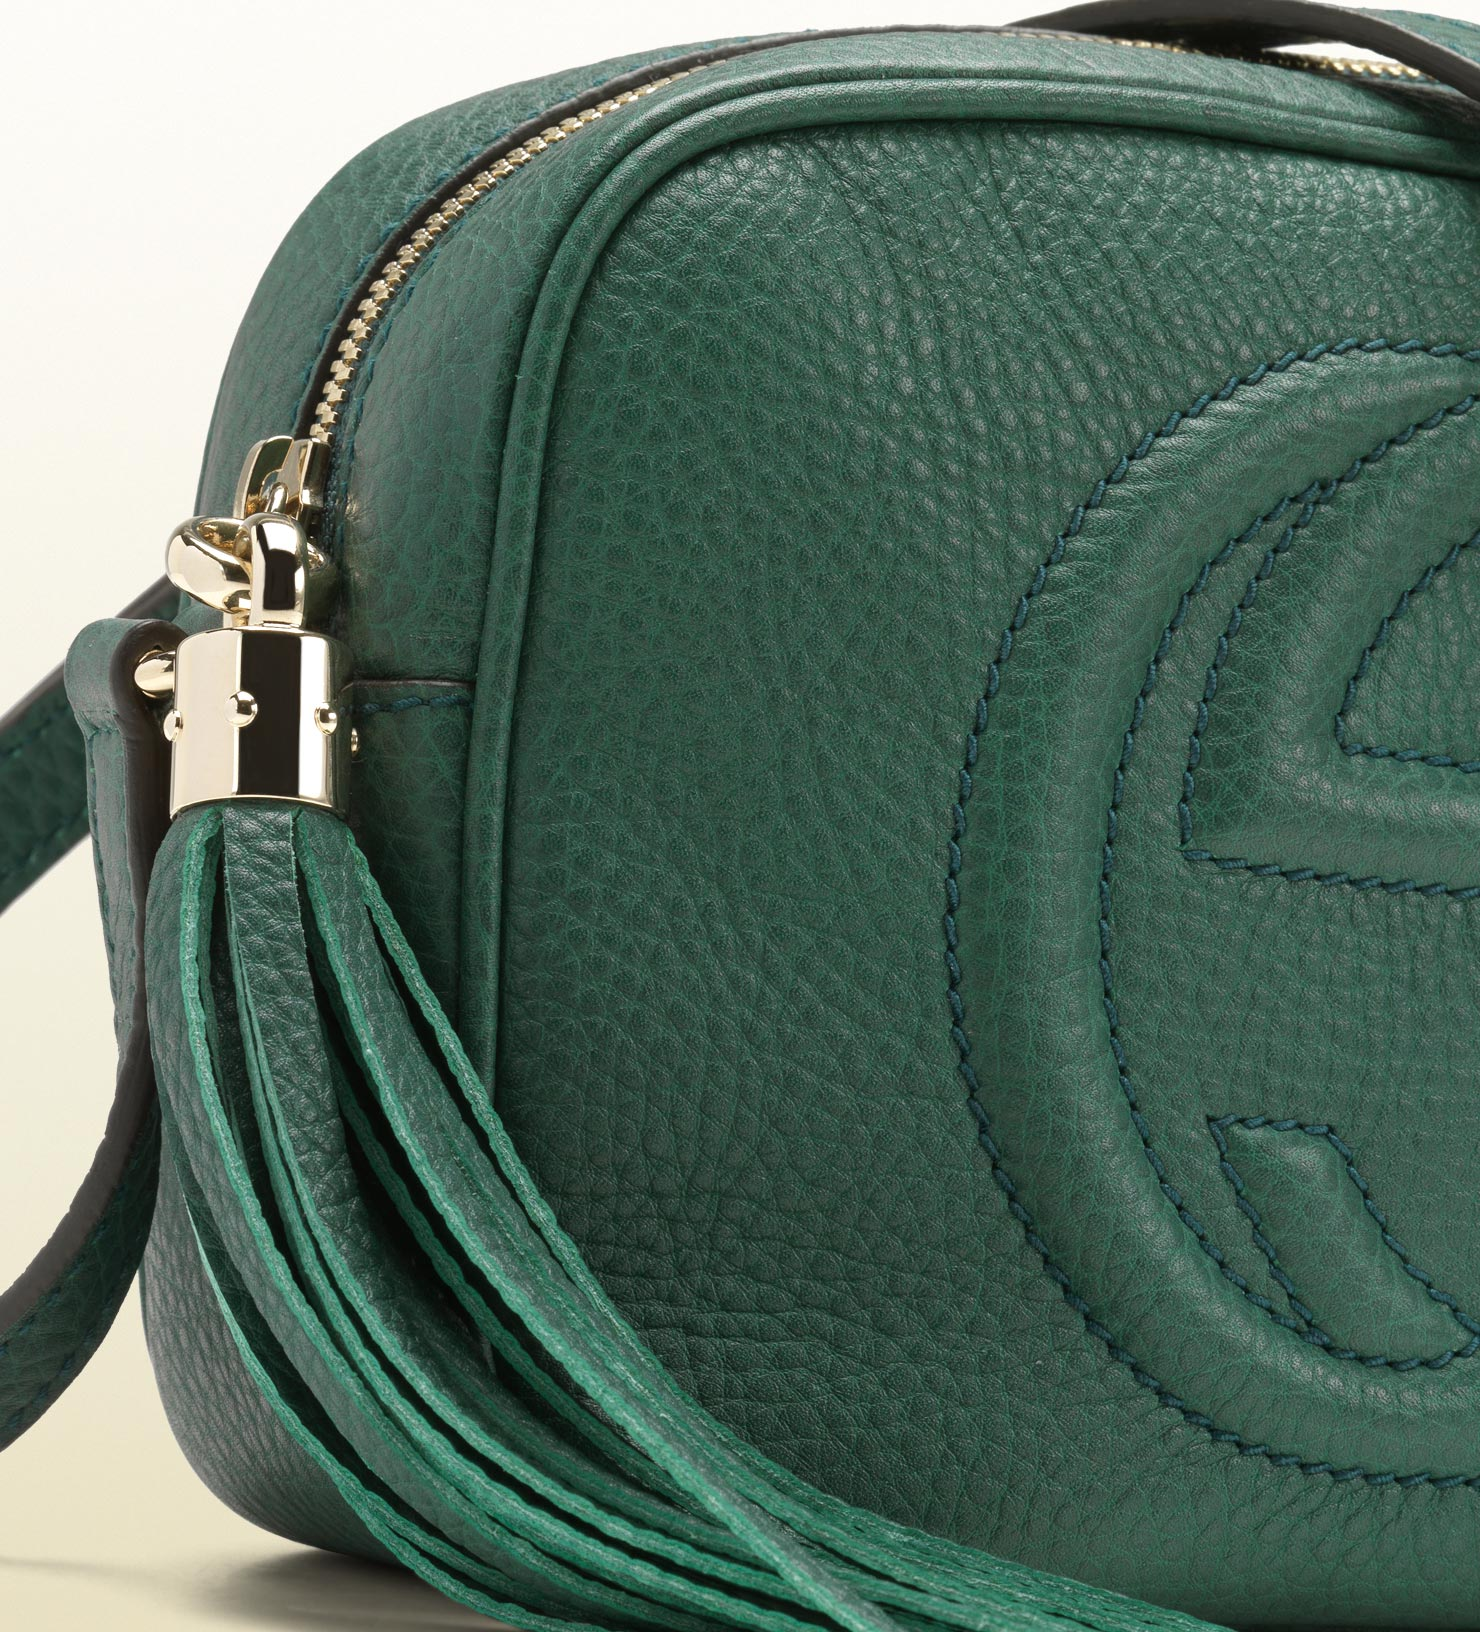 c42d00cab423 Gucci Soho Dark Green Disco Bag in Green - Lyst